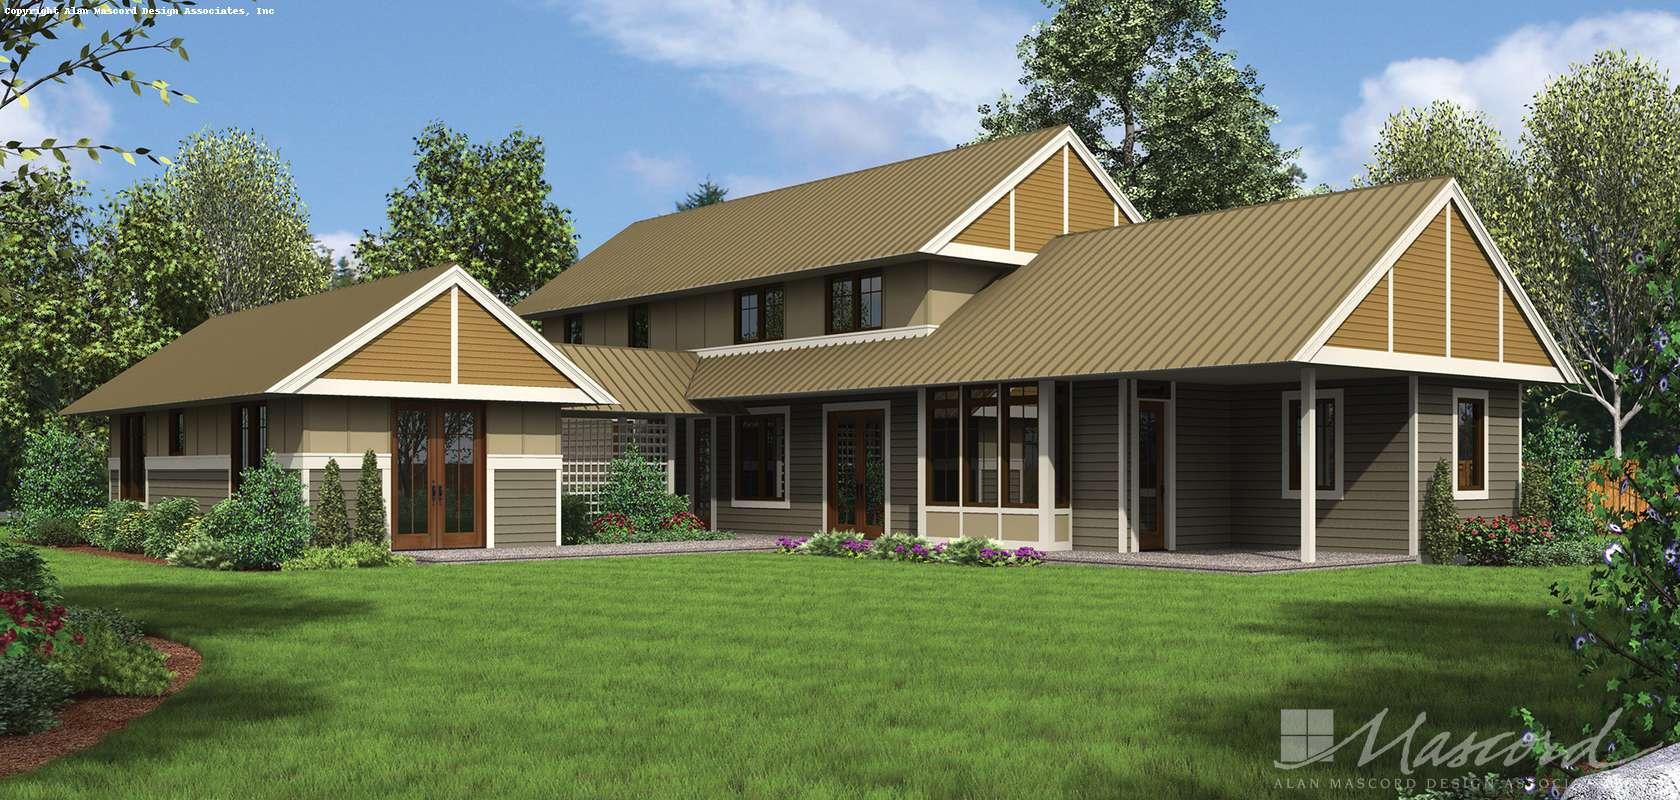 Mascord House Plan 22196: The Summerset